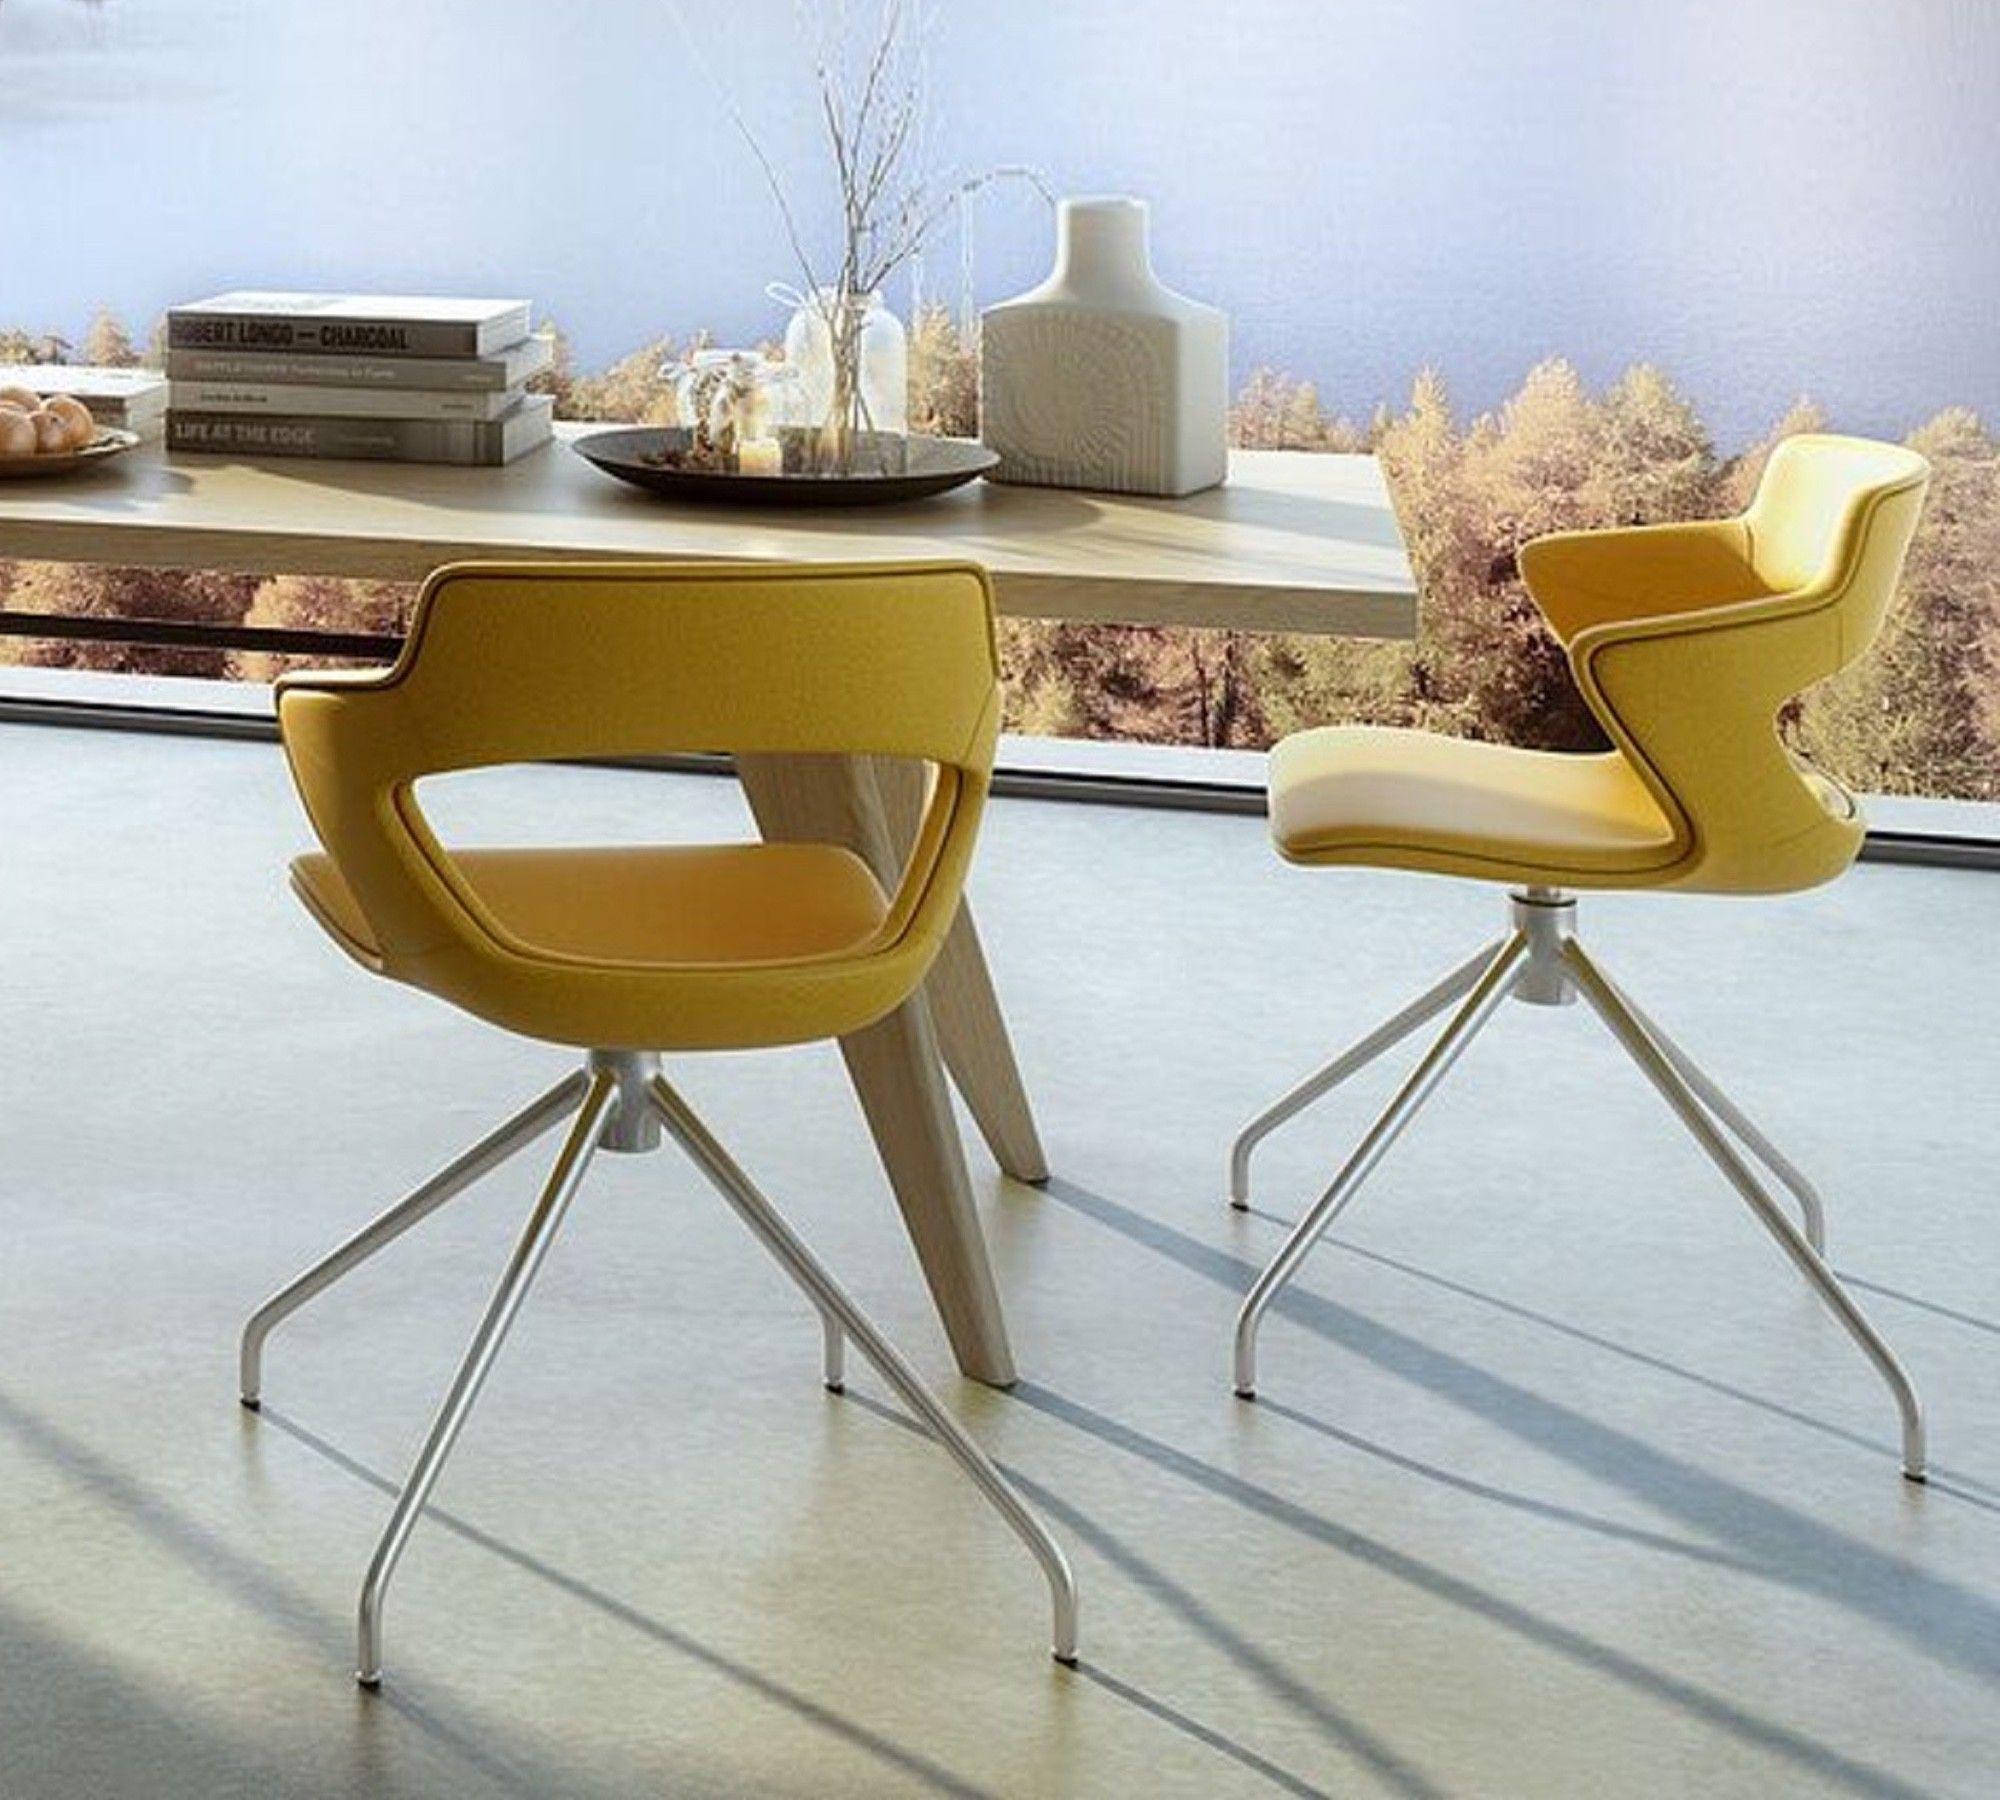 Drehstuhl esszimmer elegant stuhlsystem baldwin with for Designer drehstuhl esszimmer